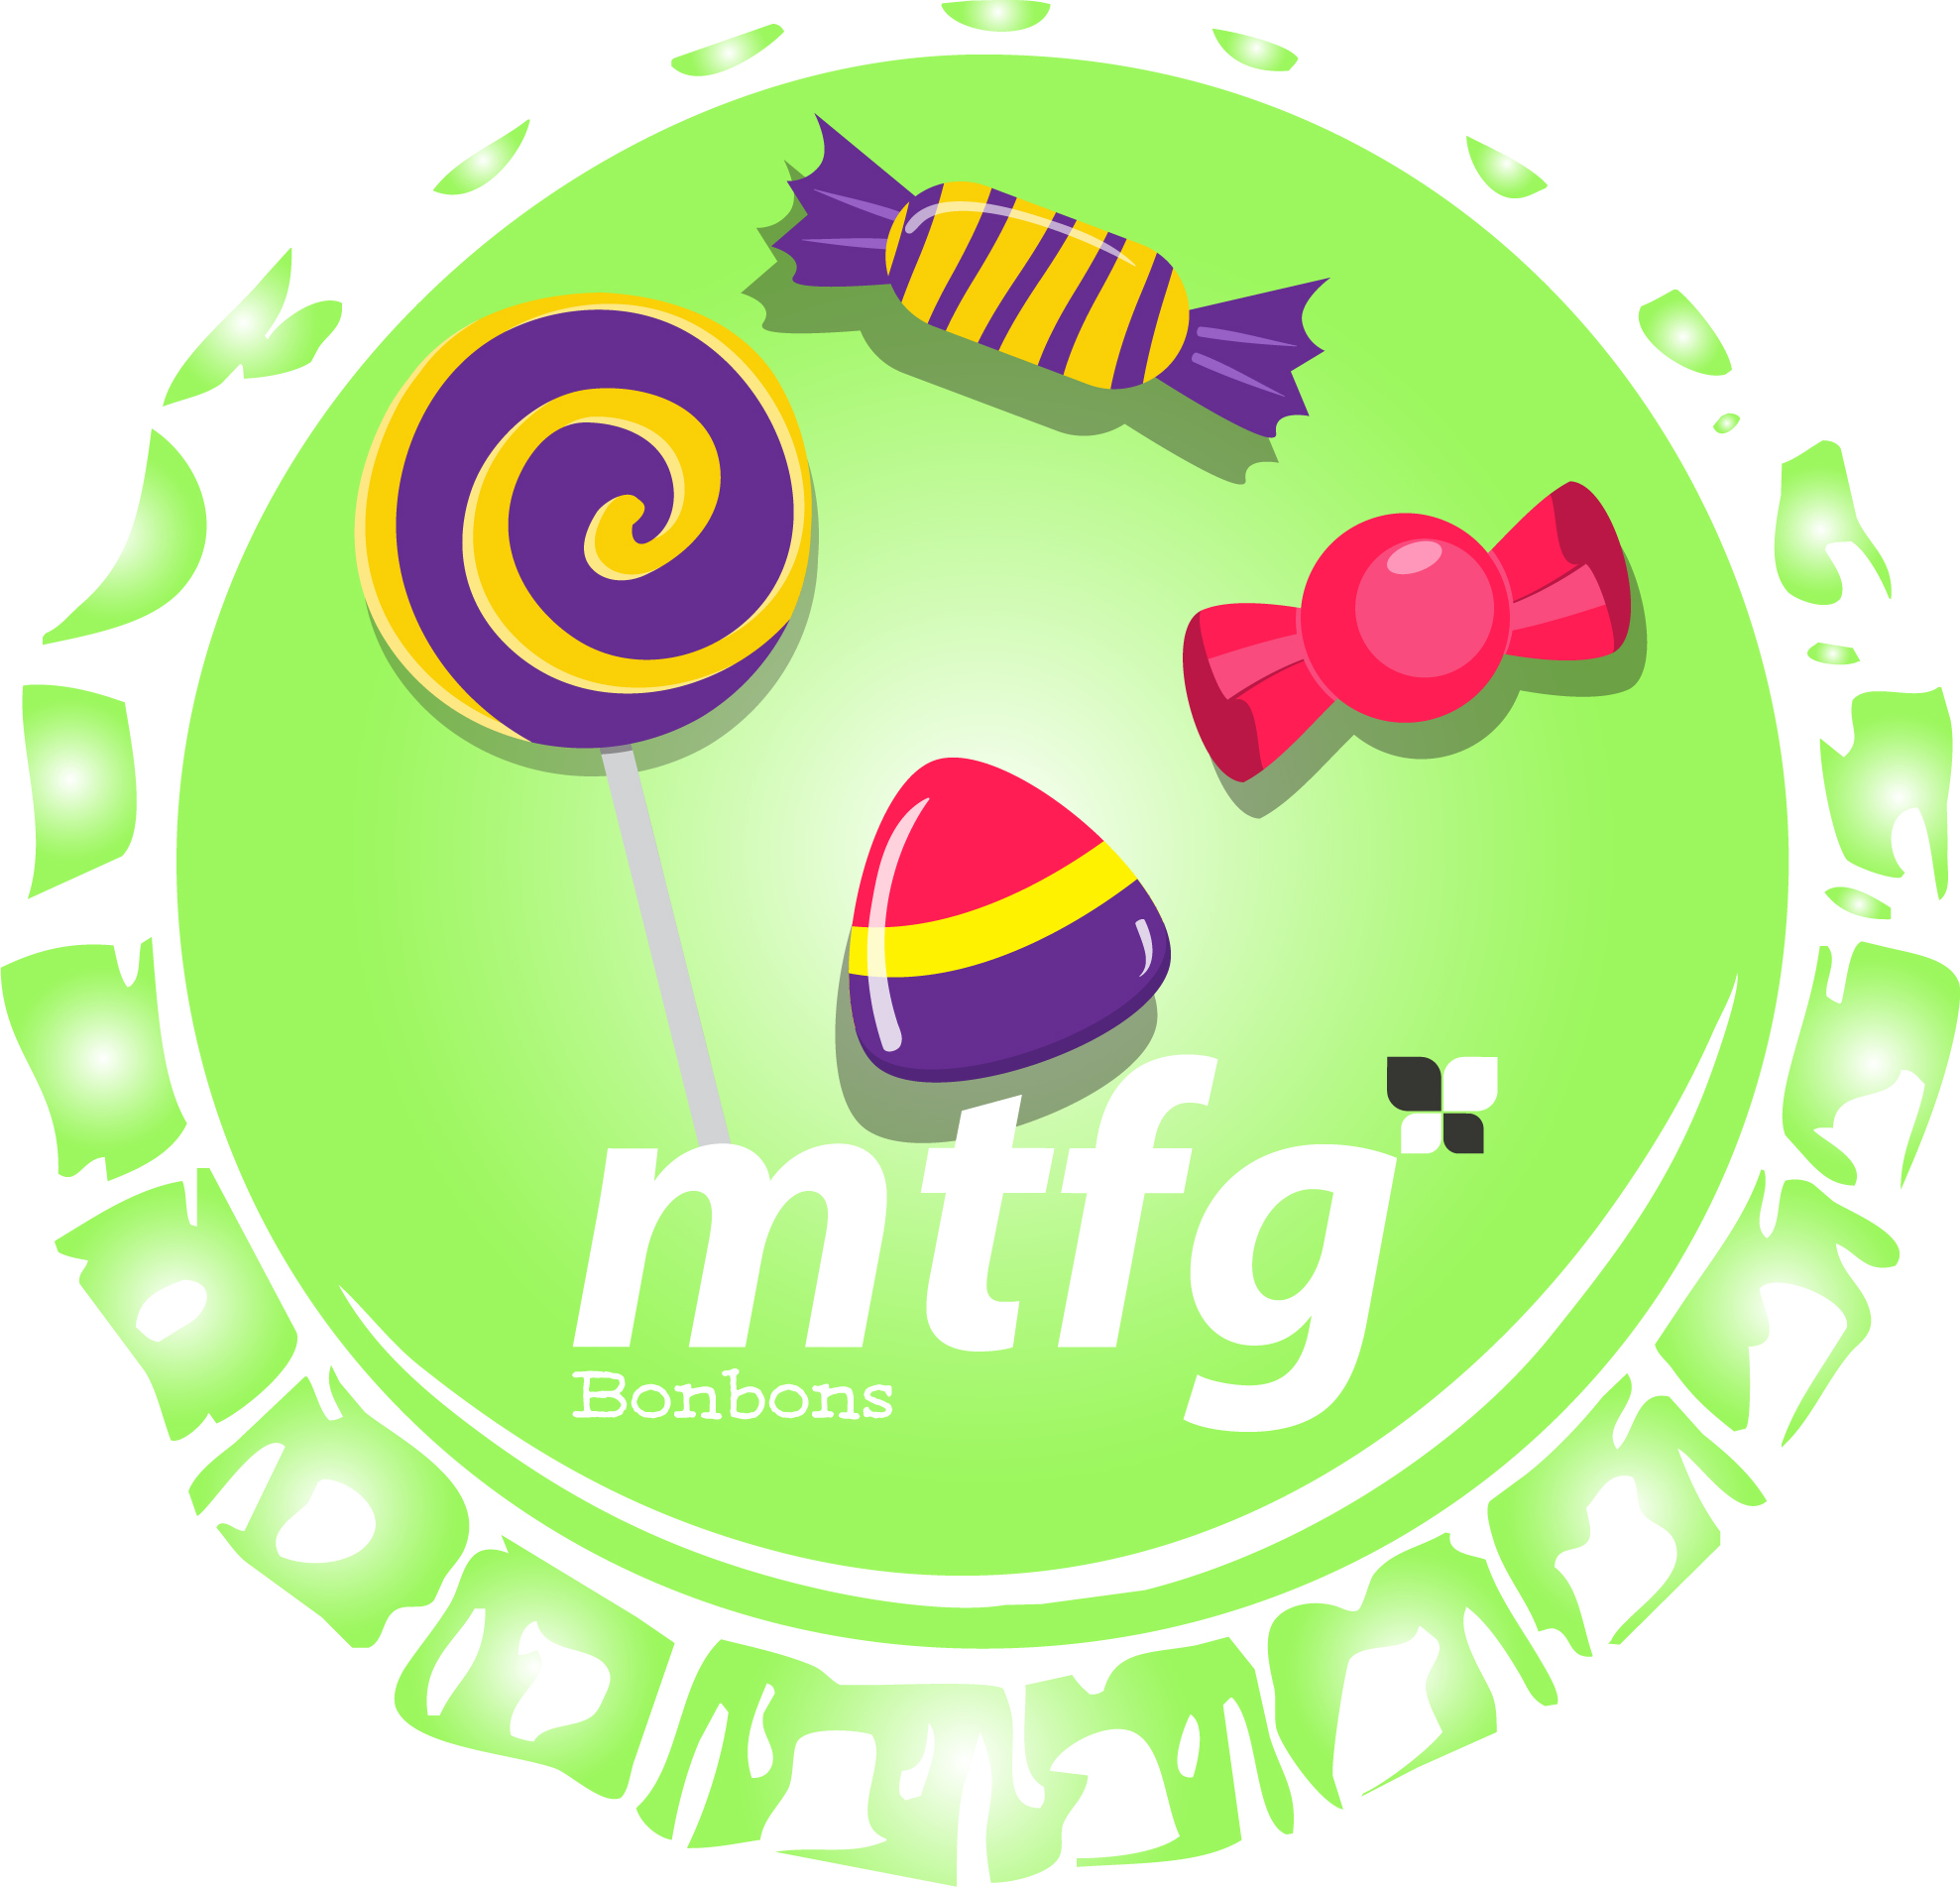 MTFG Bonbons